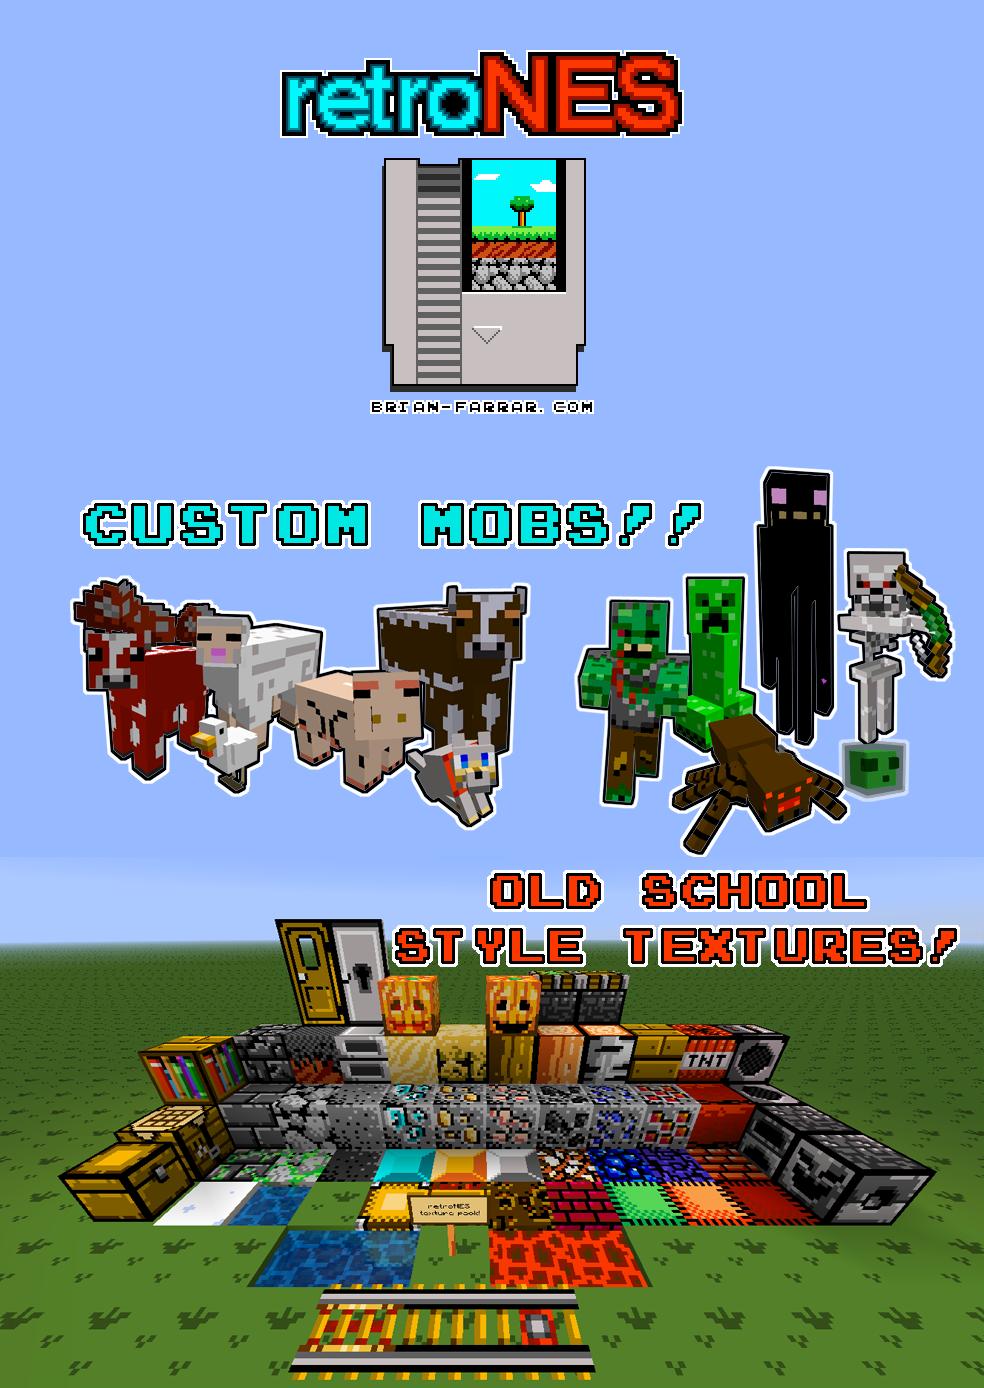 http://img.9minecraft.net/TexturePack2/Retrones-texture-pack.png